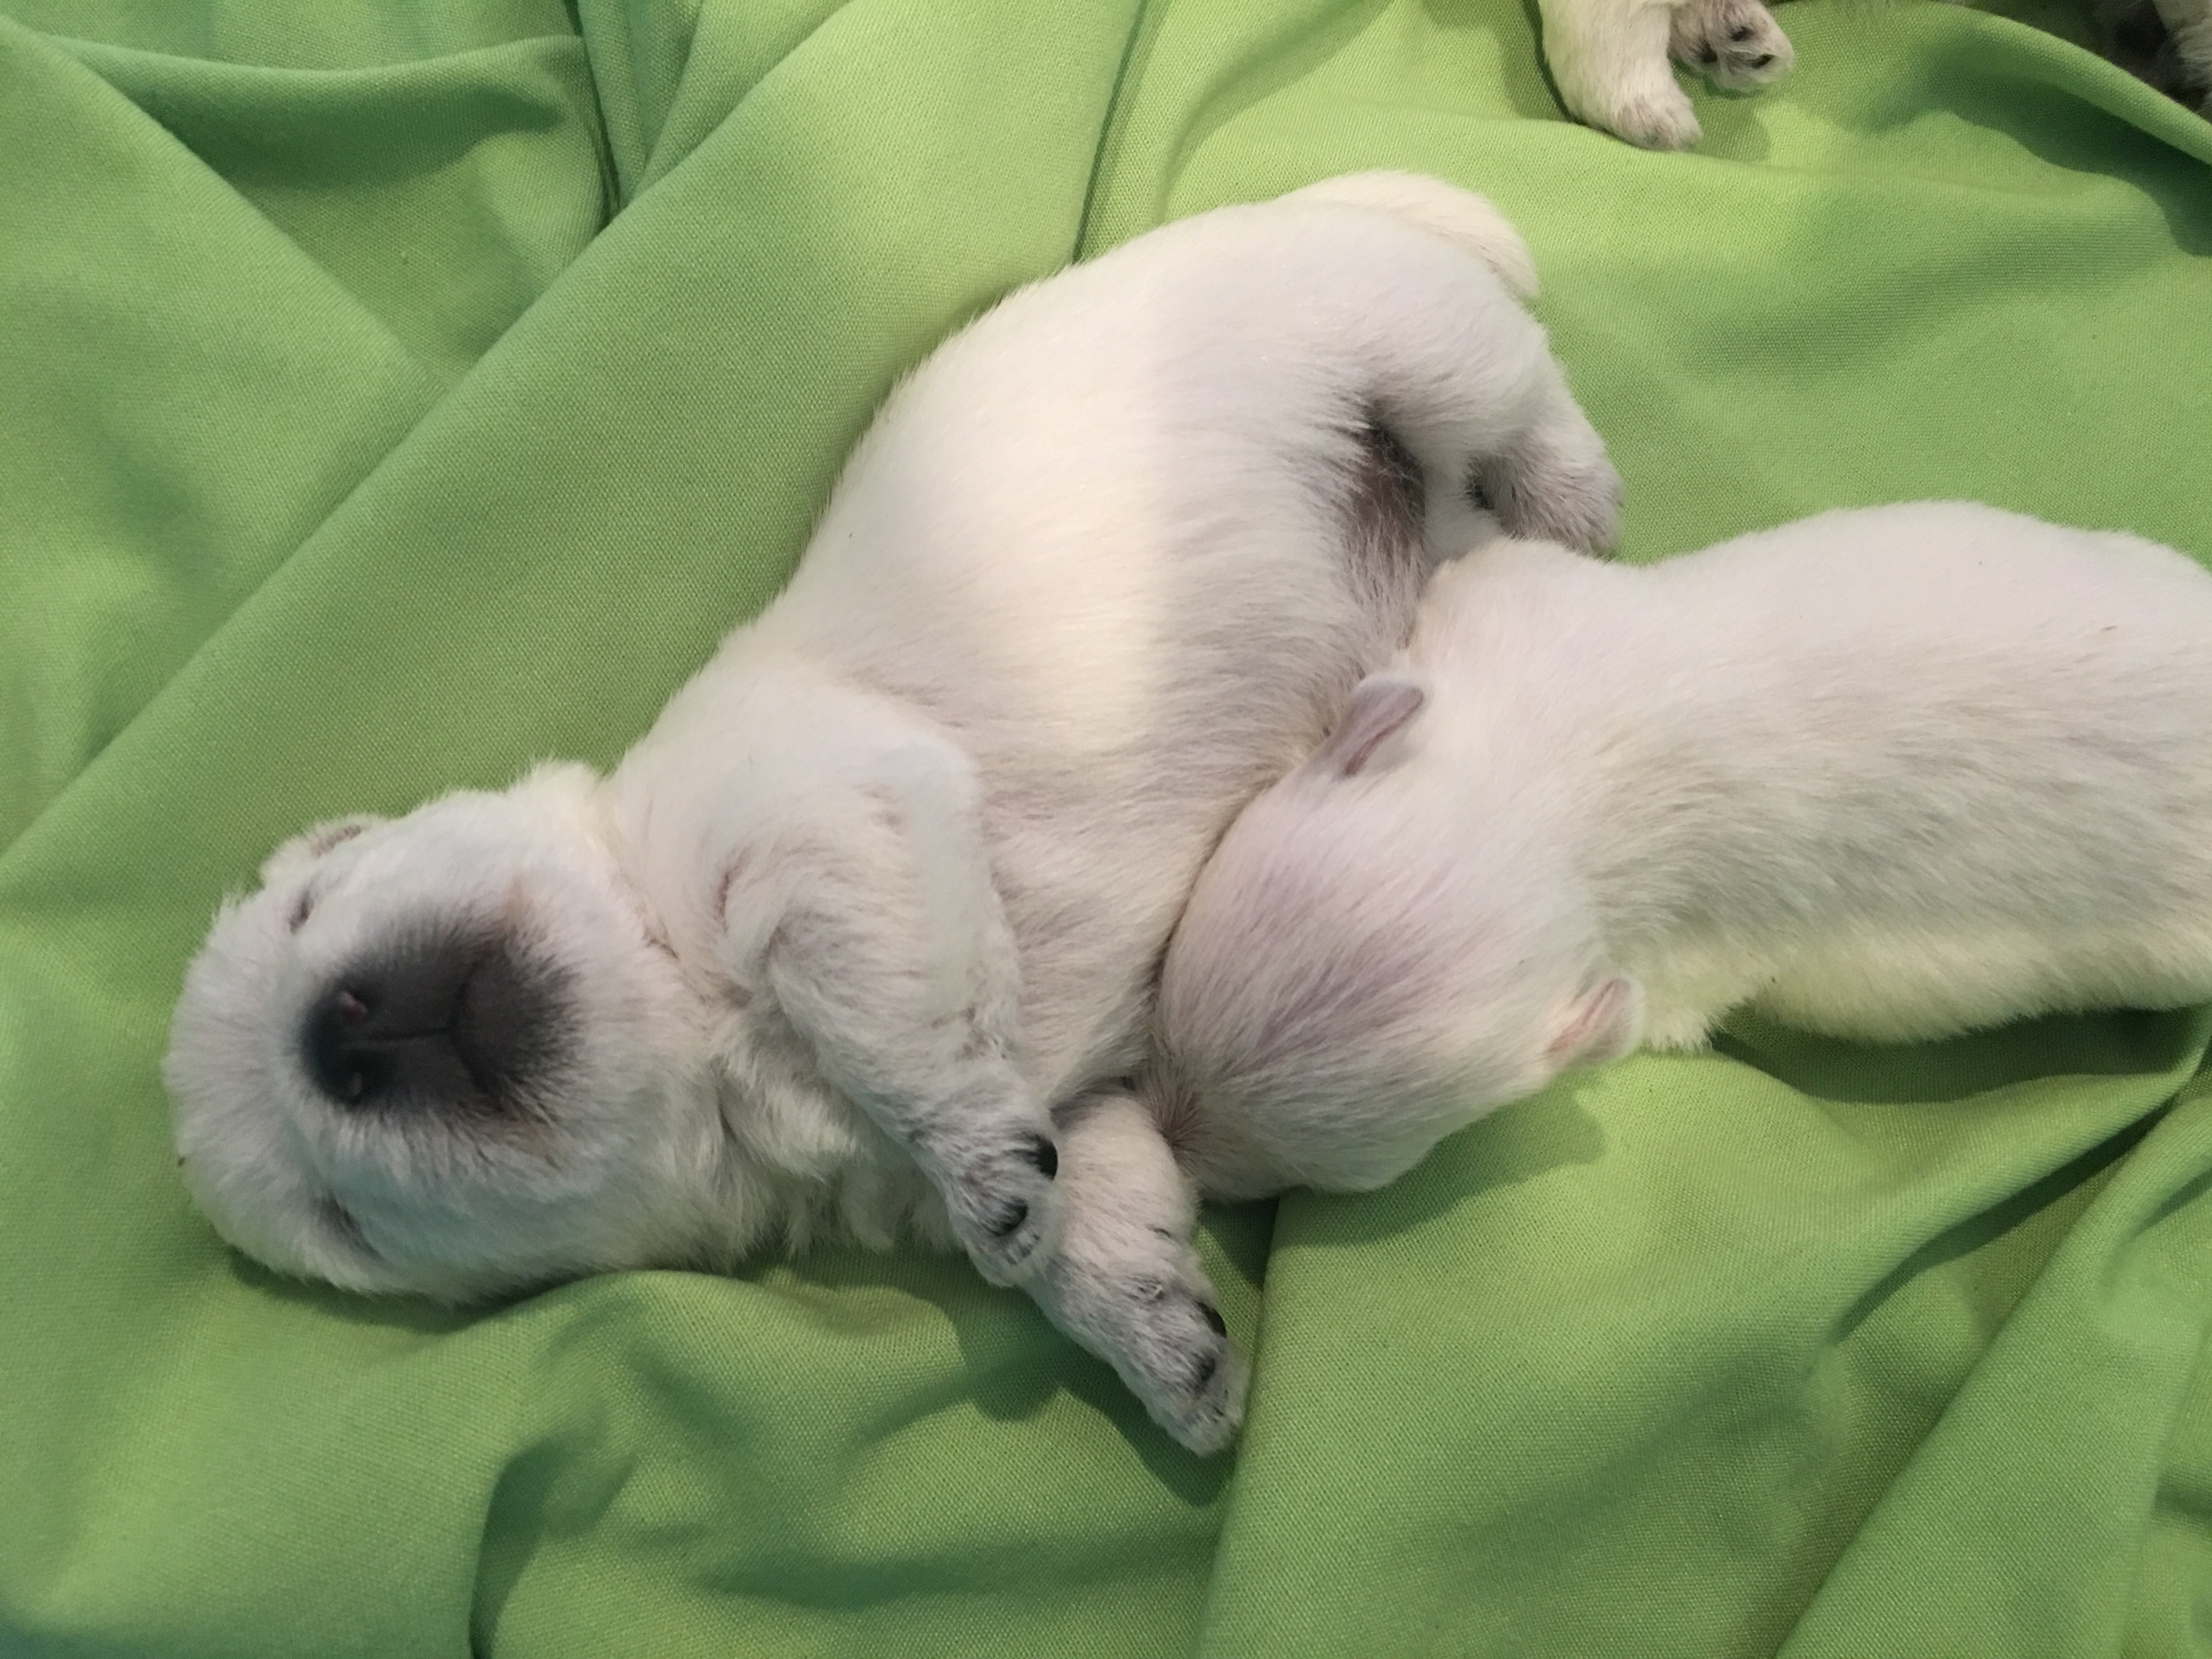 Ben: AKC West Highland White Terrier puppy for sale (Loveland, Colorado) |  VIP Puppies